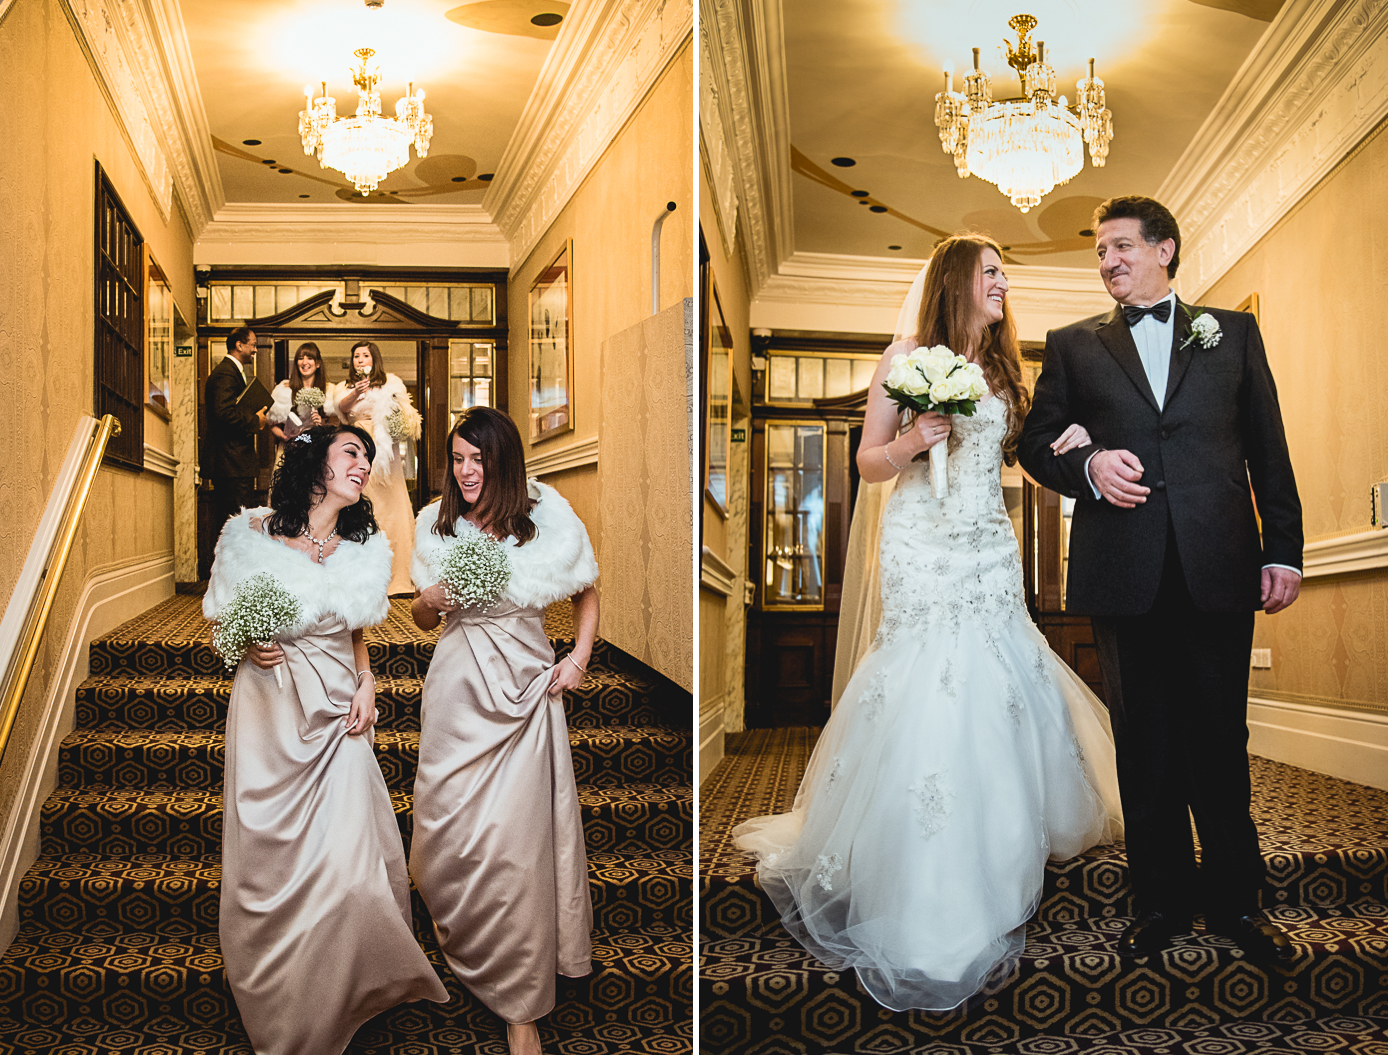 30 - Esmat and Angus - St. Ermin's Hotel London wedding photographer